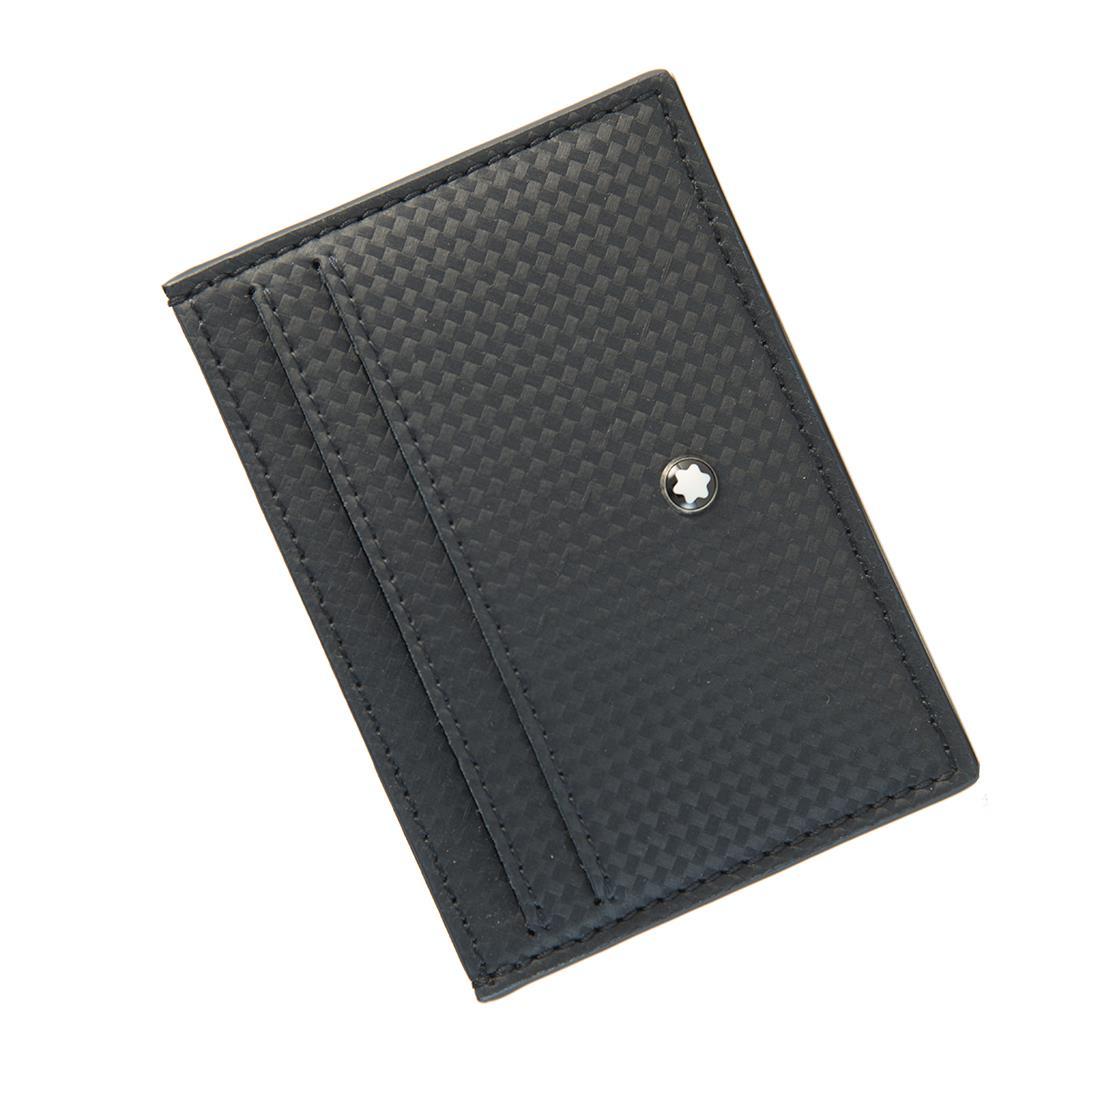 Custodia portacarte tascabile Montblanc a 5 scomparti - MONTBLANC